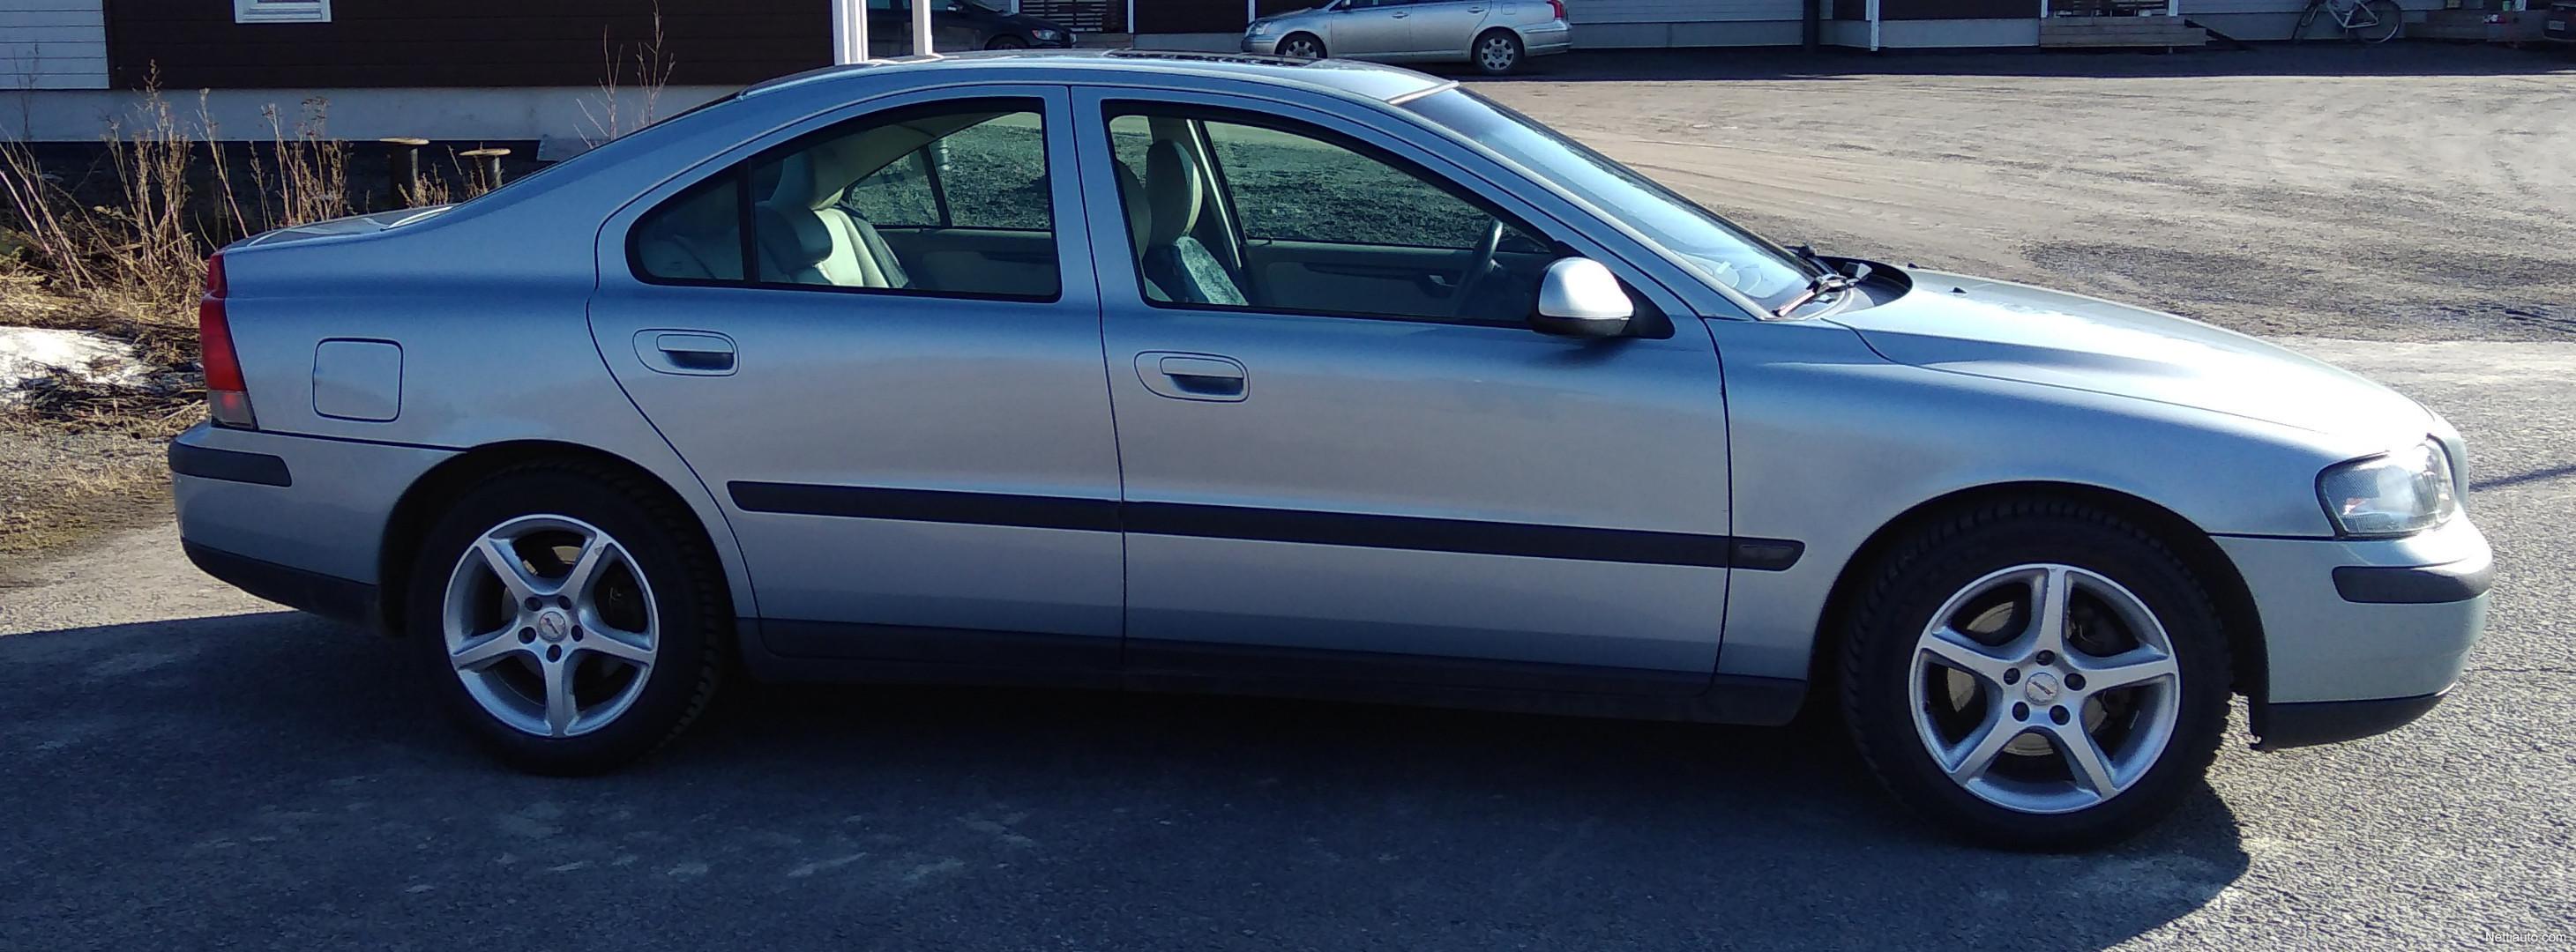 Volvo S60 2 4 4d 125kw